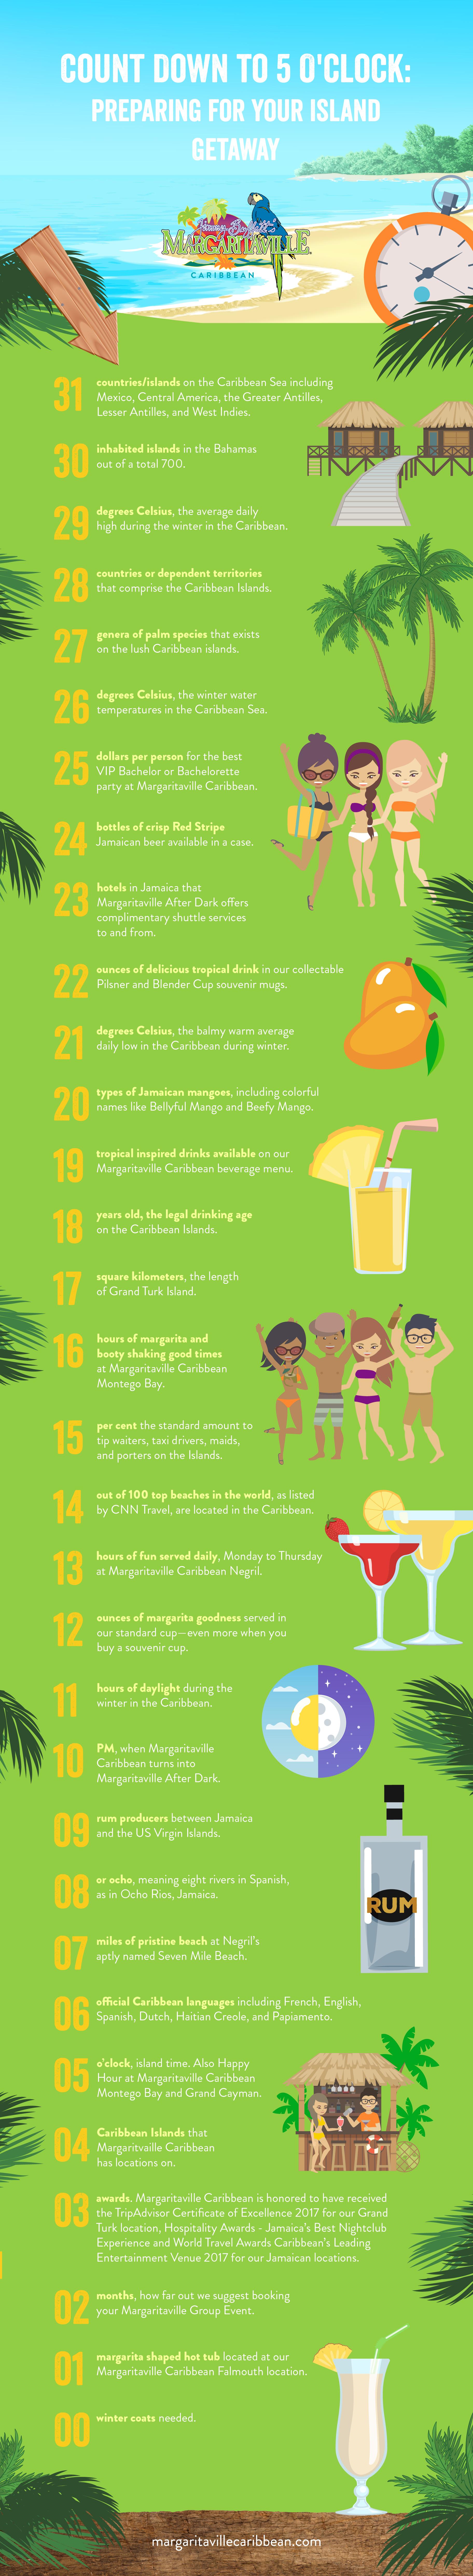 Infographic of margaritaville 5 o'clock